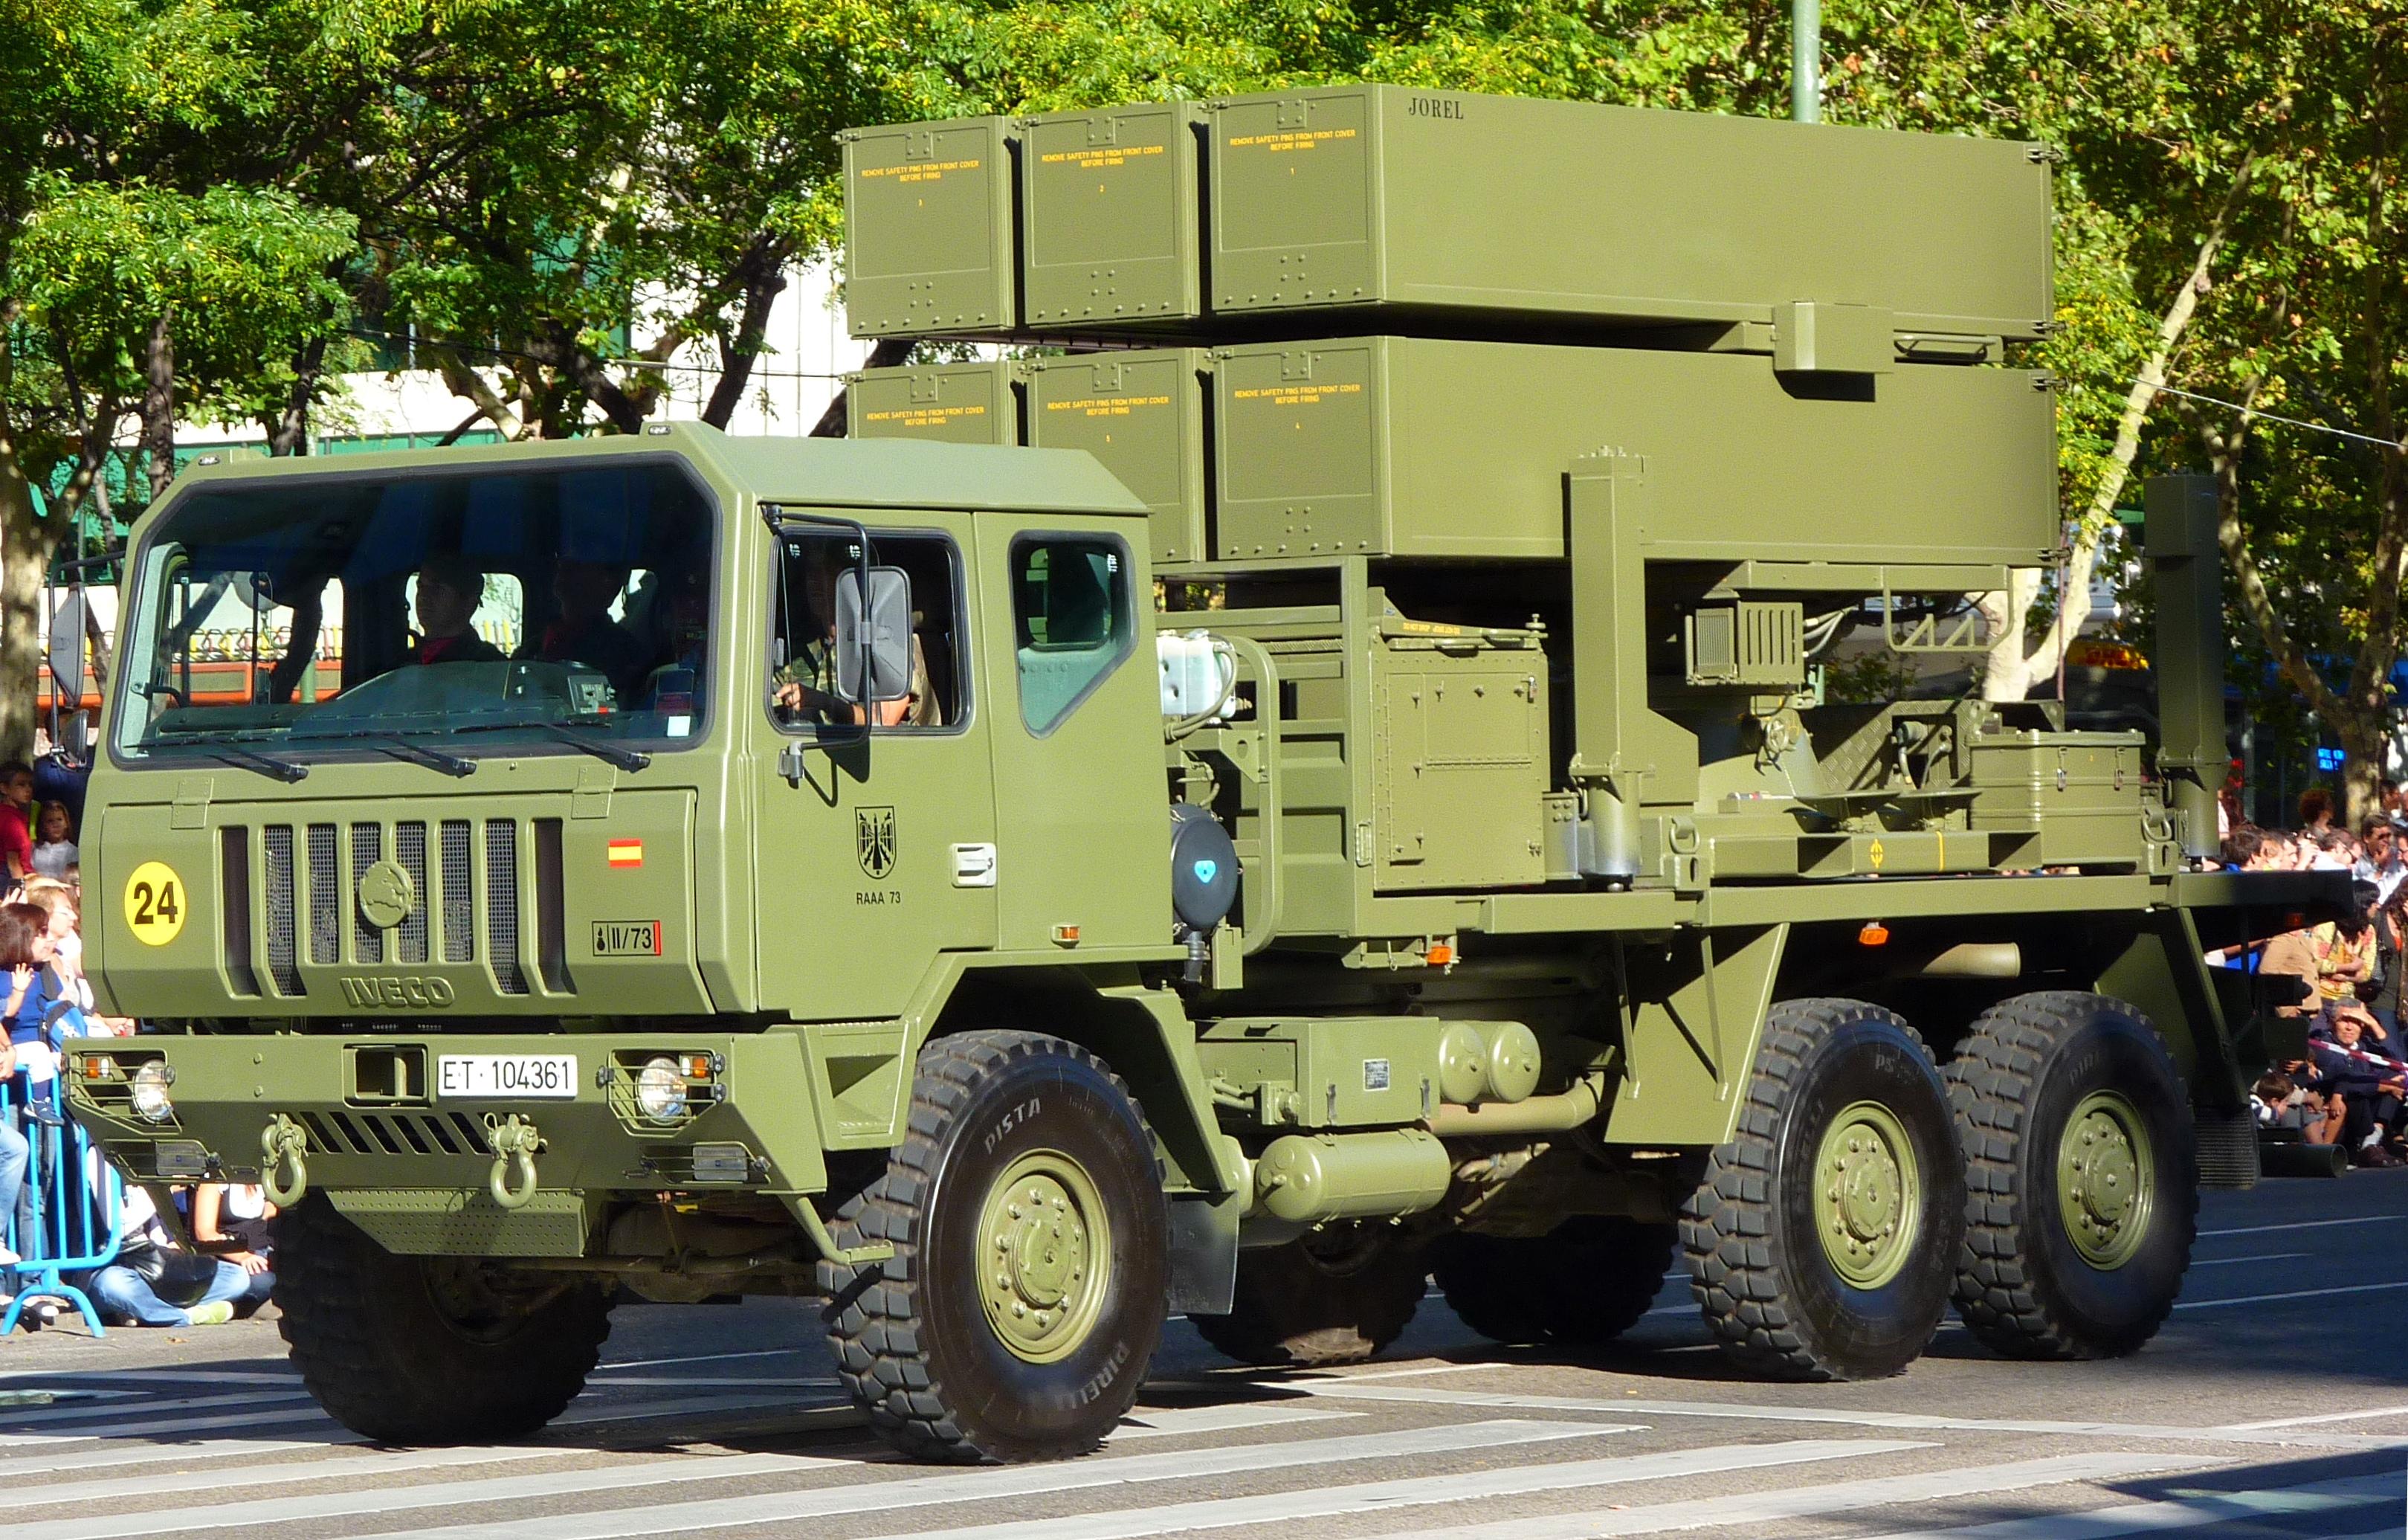 Governo Indiano seleciona o sistema NASAMS II para defesa antiaérea da capital Nova Delhi